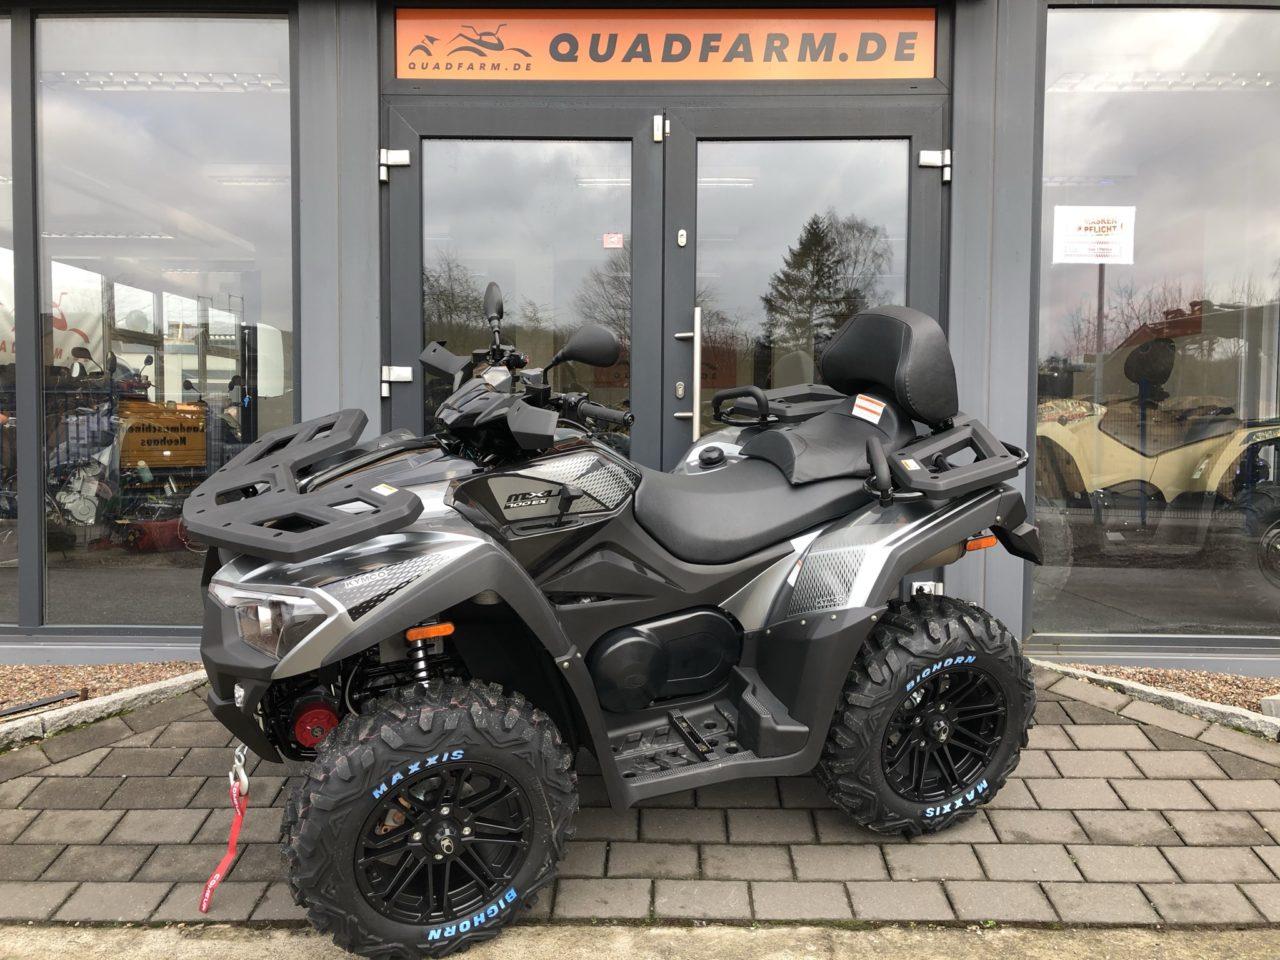 ATV / Quad Kymco MXU 700i T EPS, ABS, Servo, 4×4, 48 PS, 695 ccm